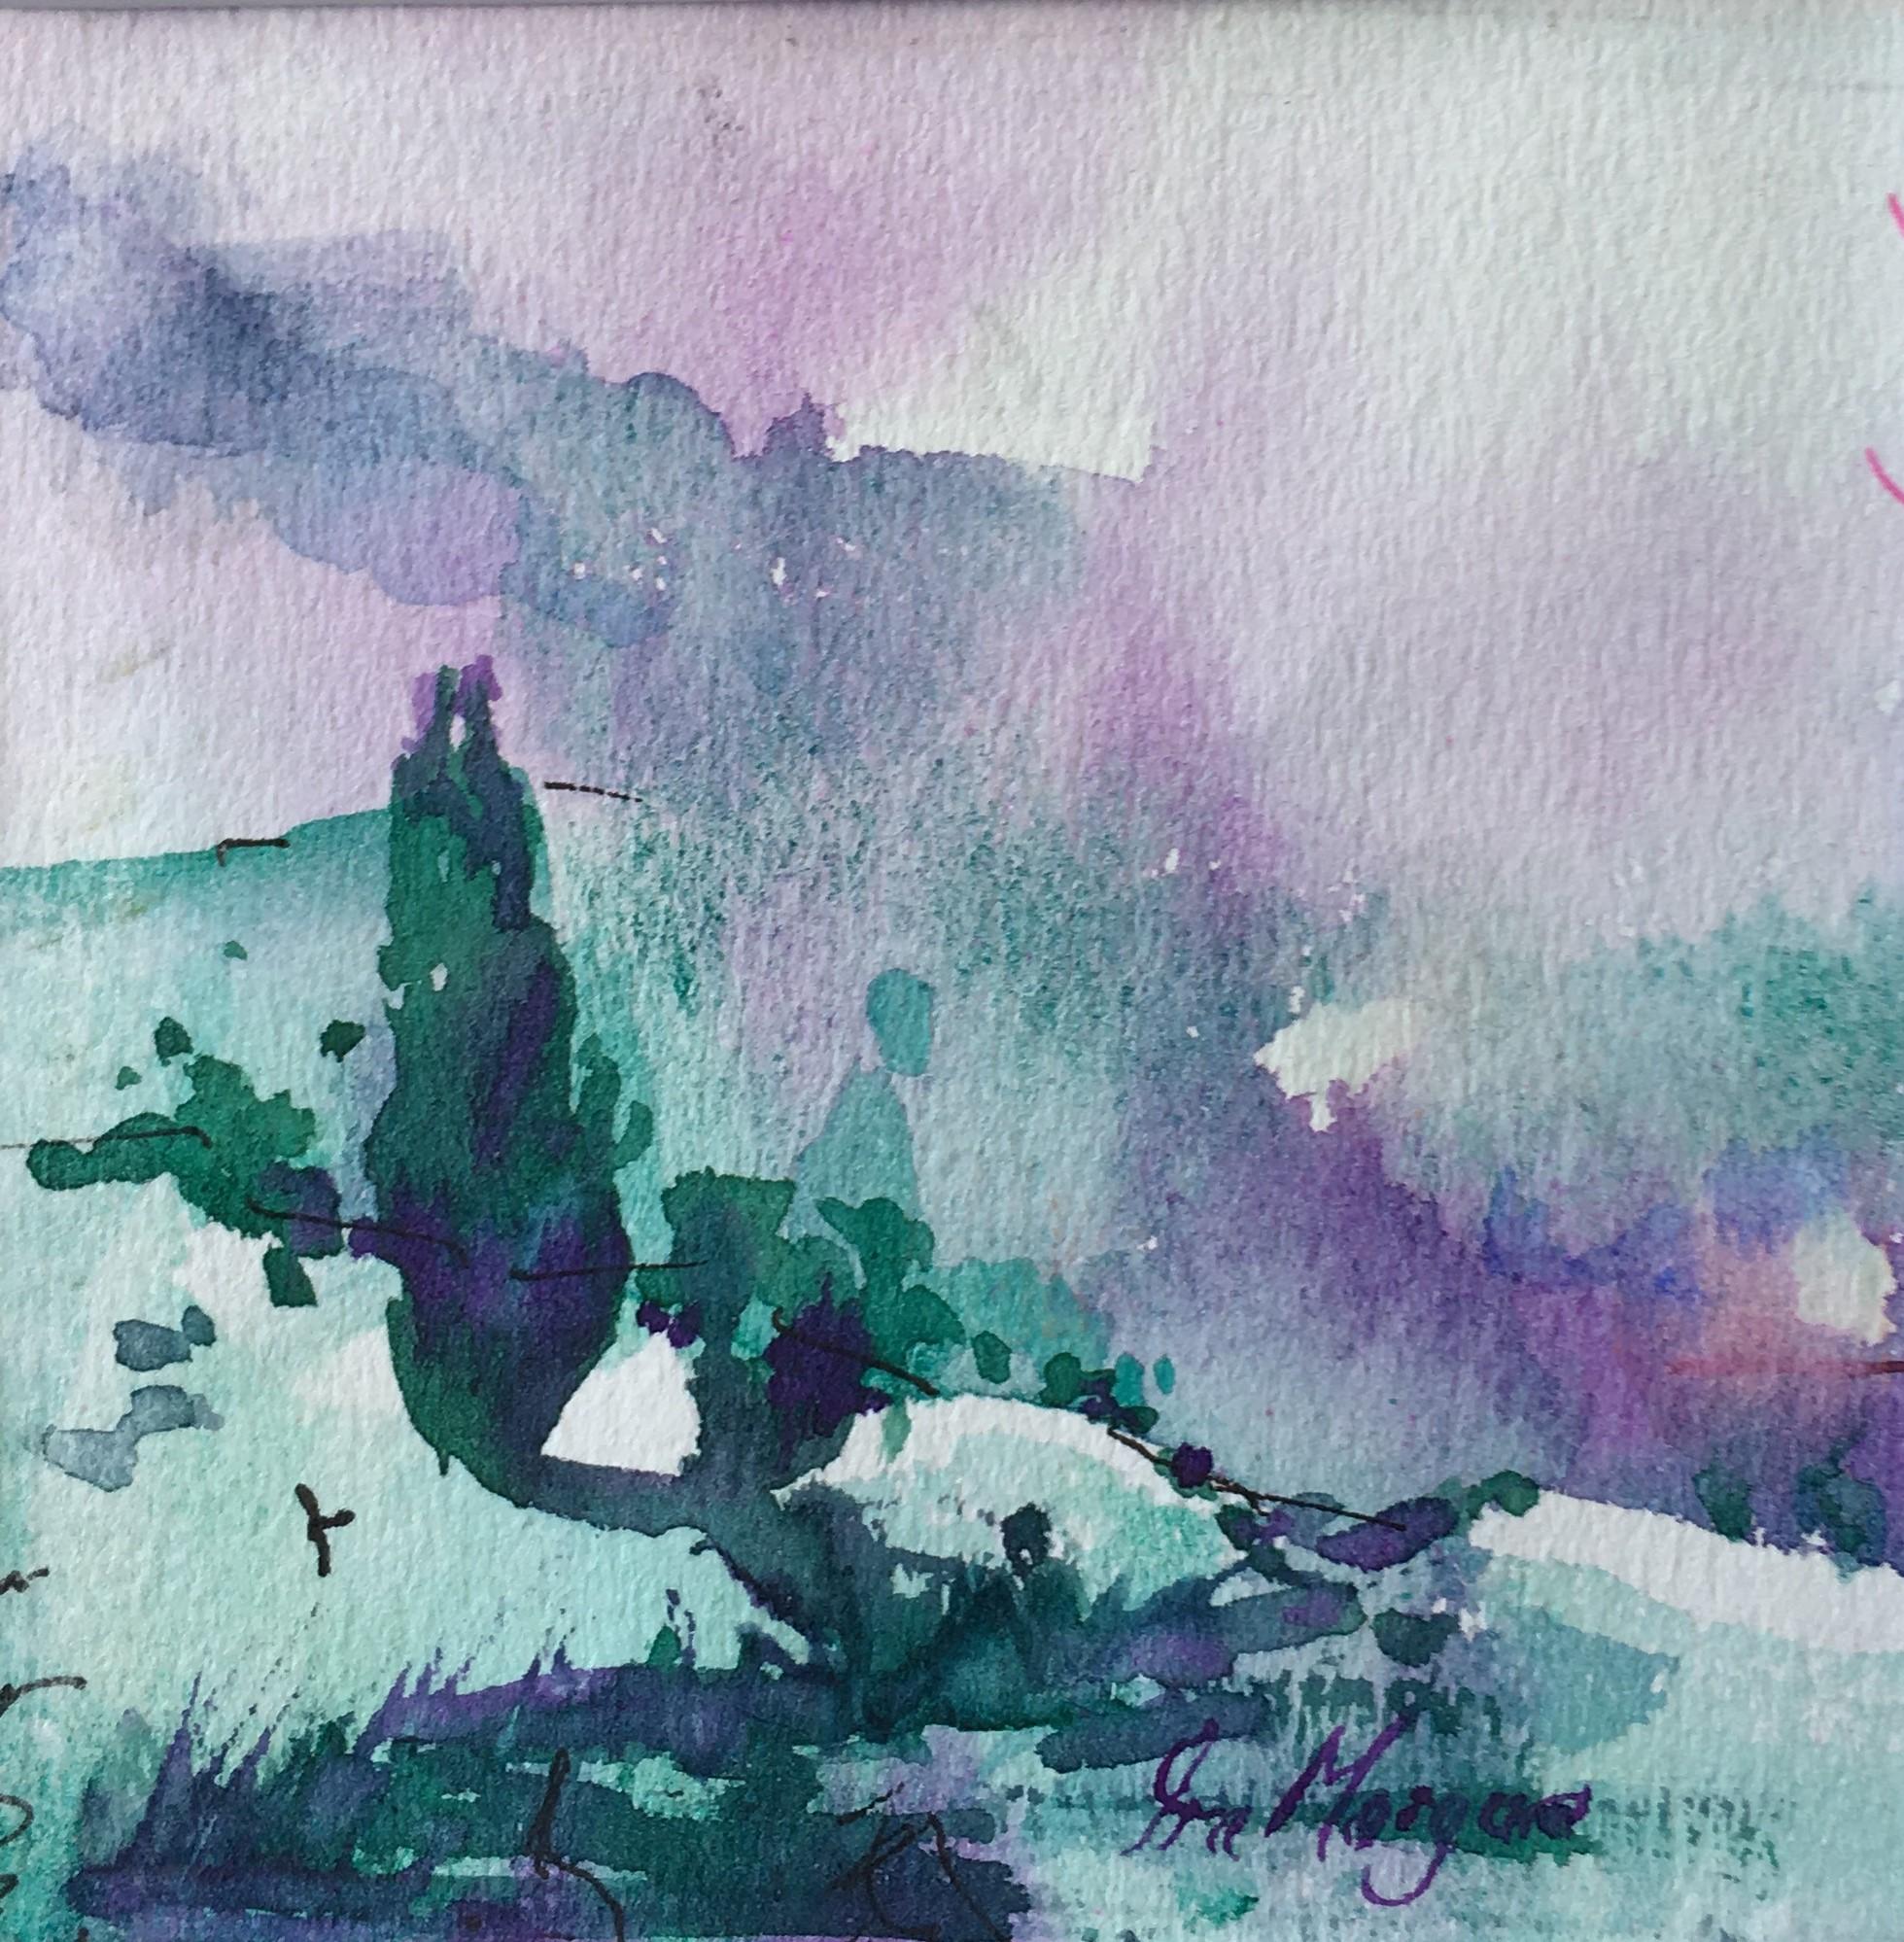 450. 'Misty hills'